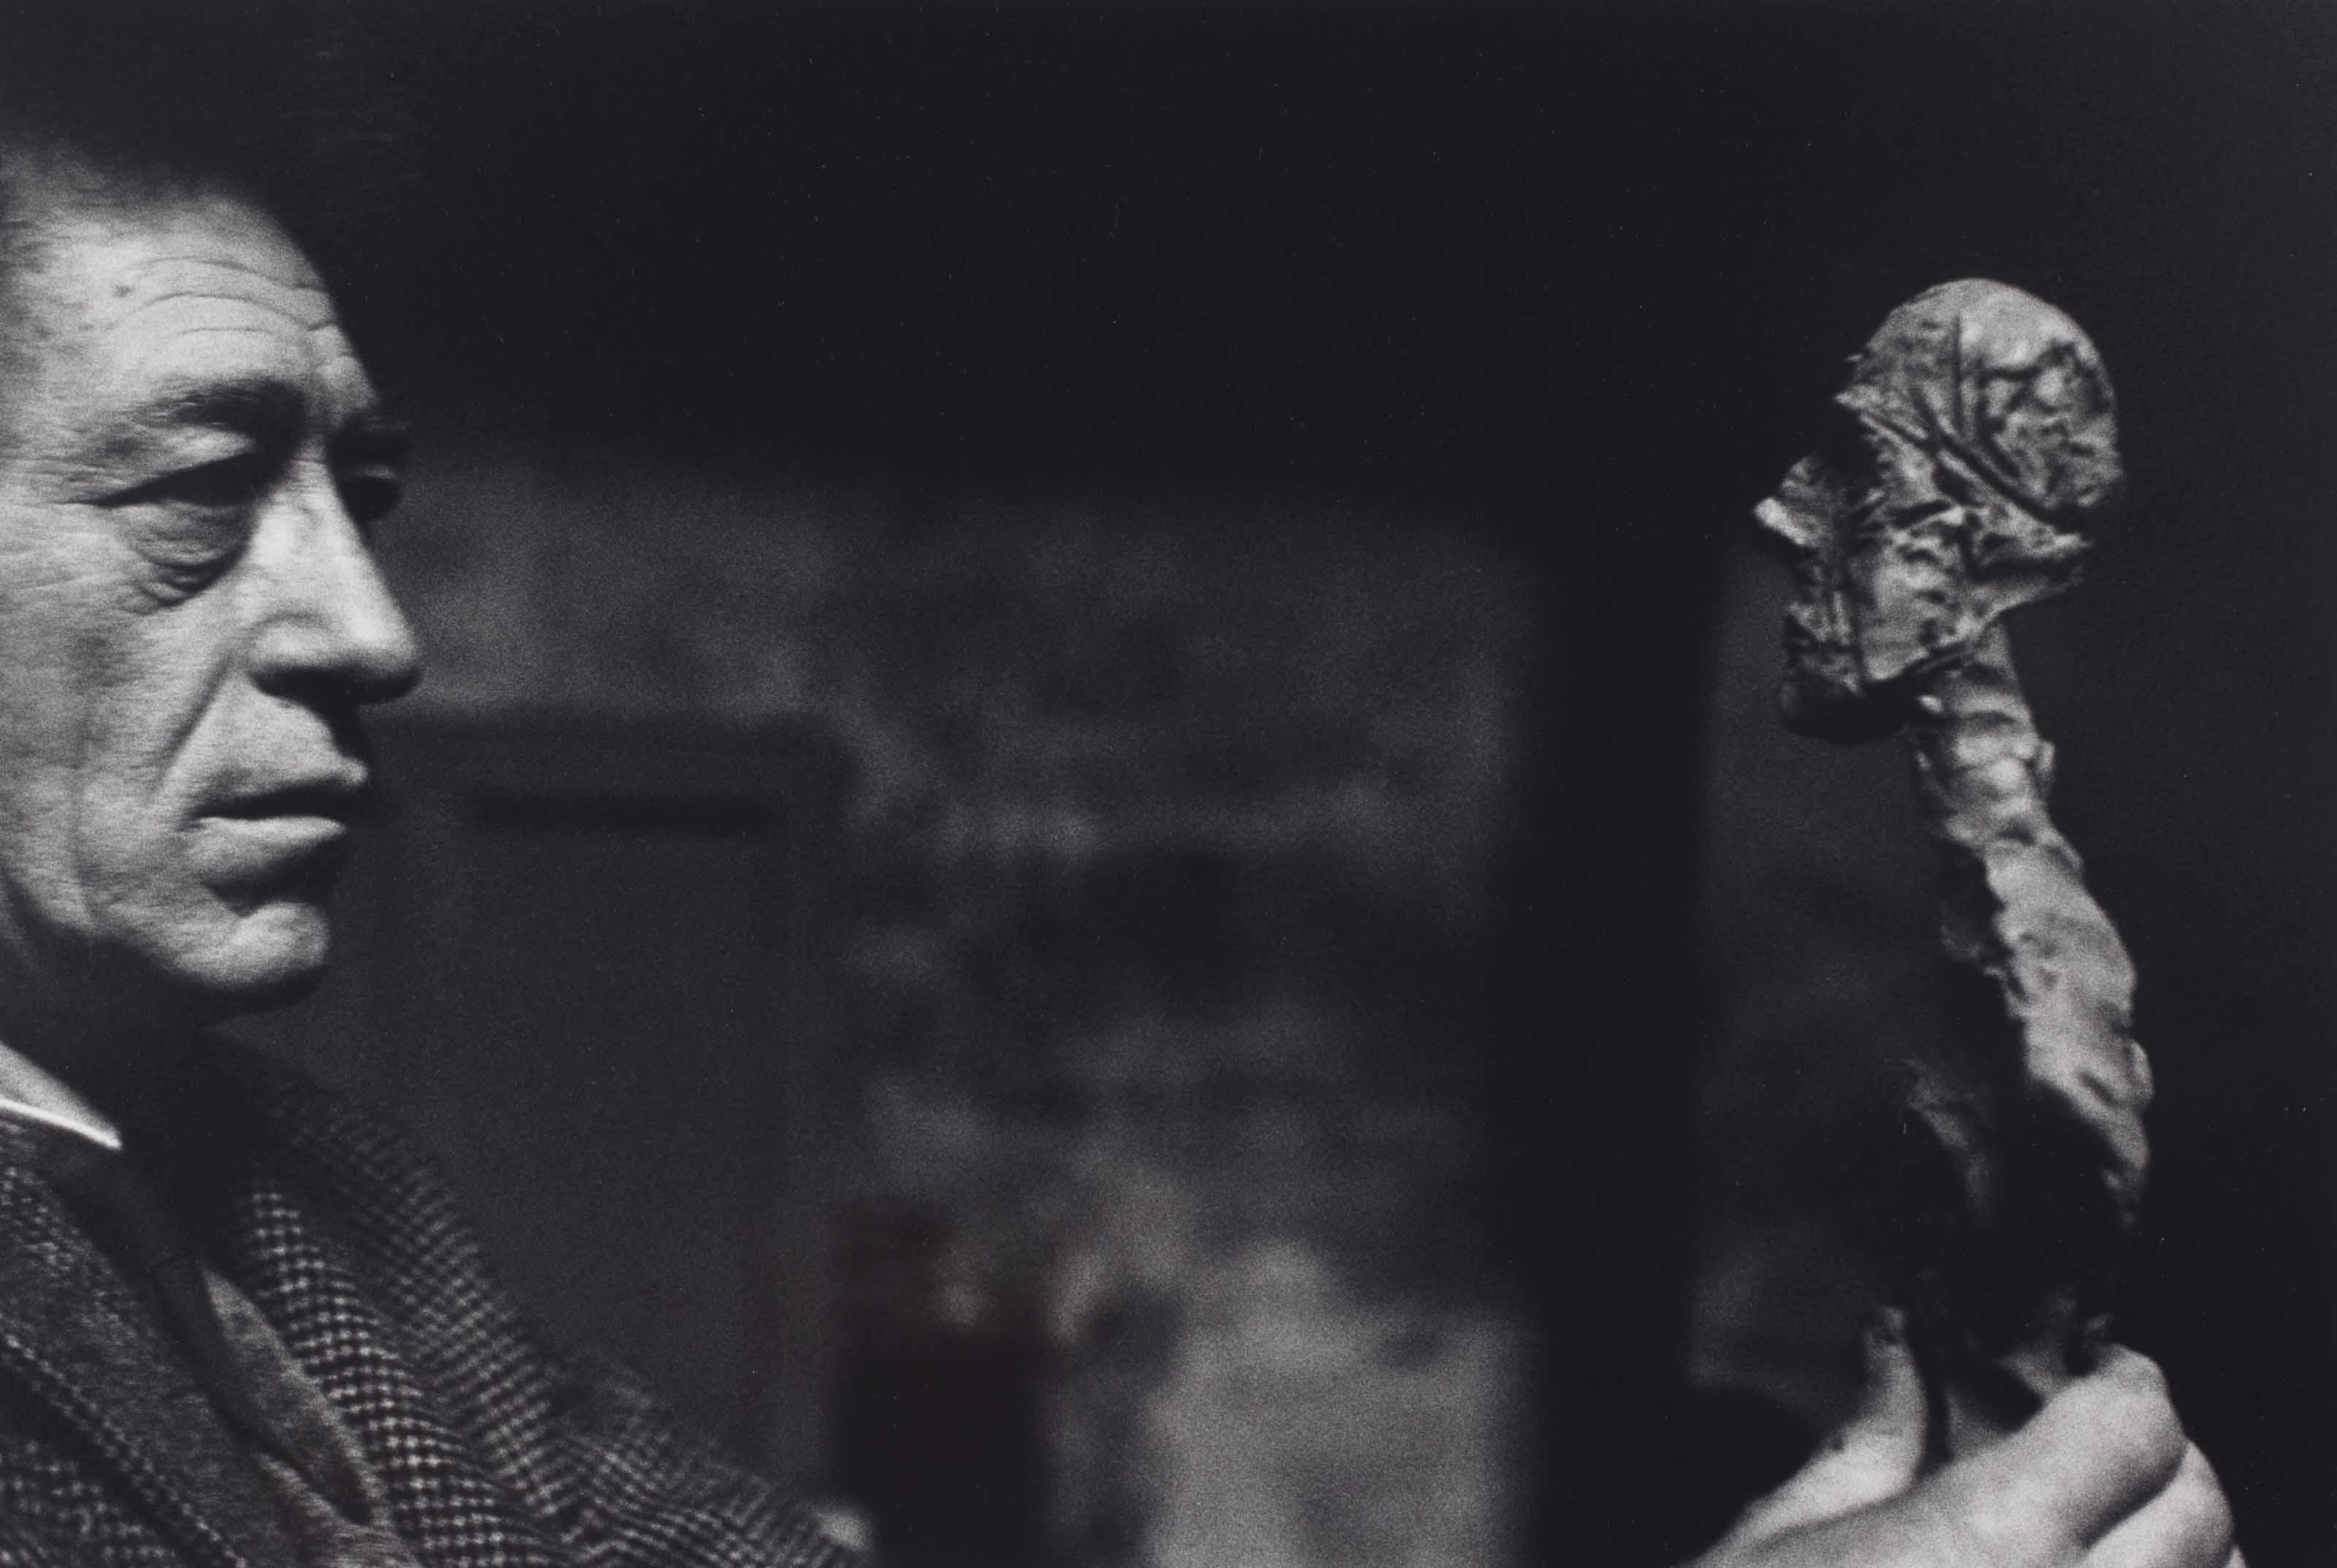 Alberto Giacometti, Paris, 1960